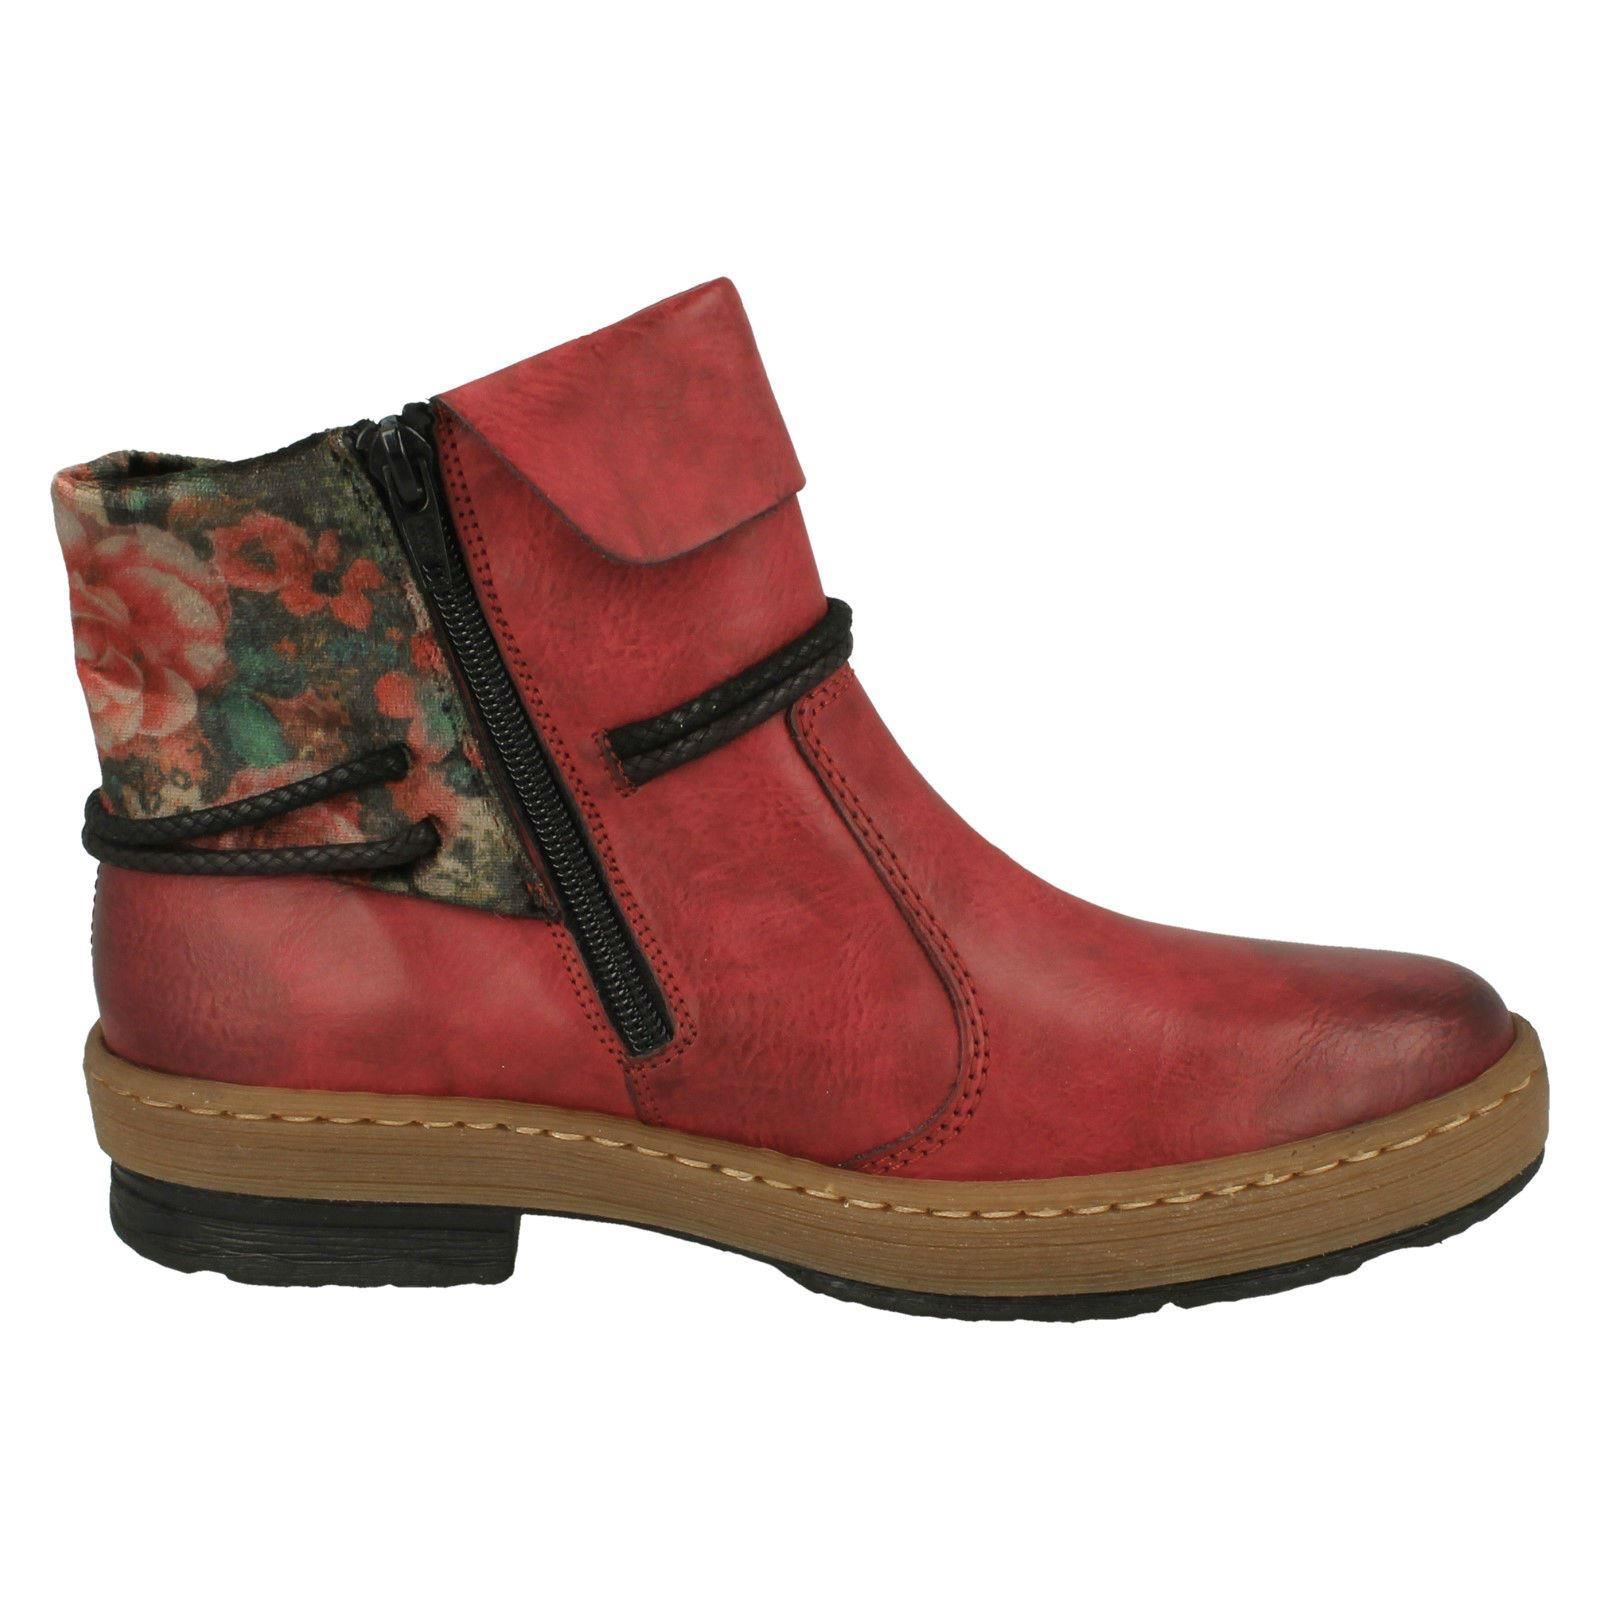 Rieker Fleece Ladies Red Boots Z6771 Ankle Lined Zip Warm Casual dAw6gqIwf